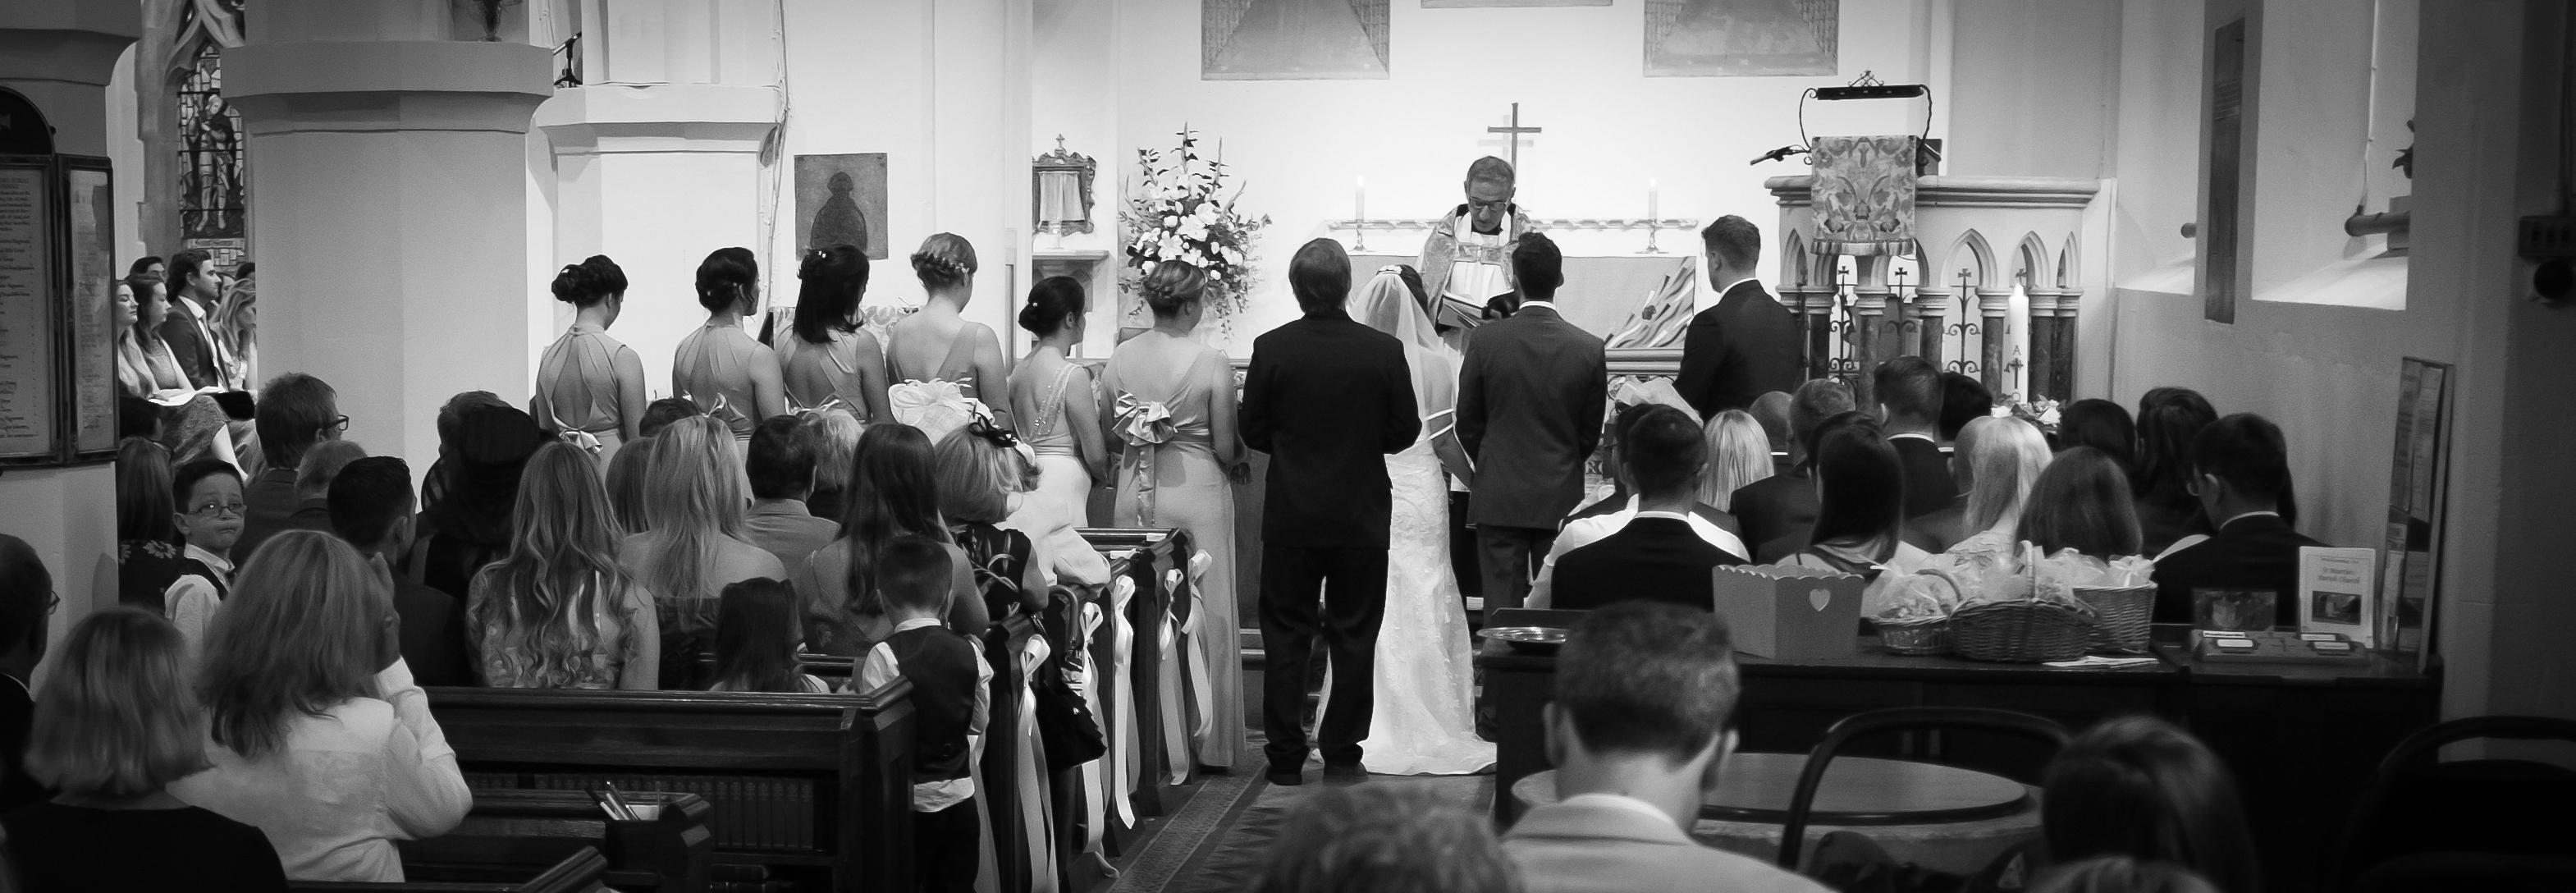 St Martins East Horsley Weddings